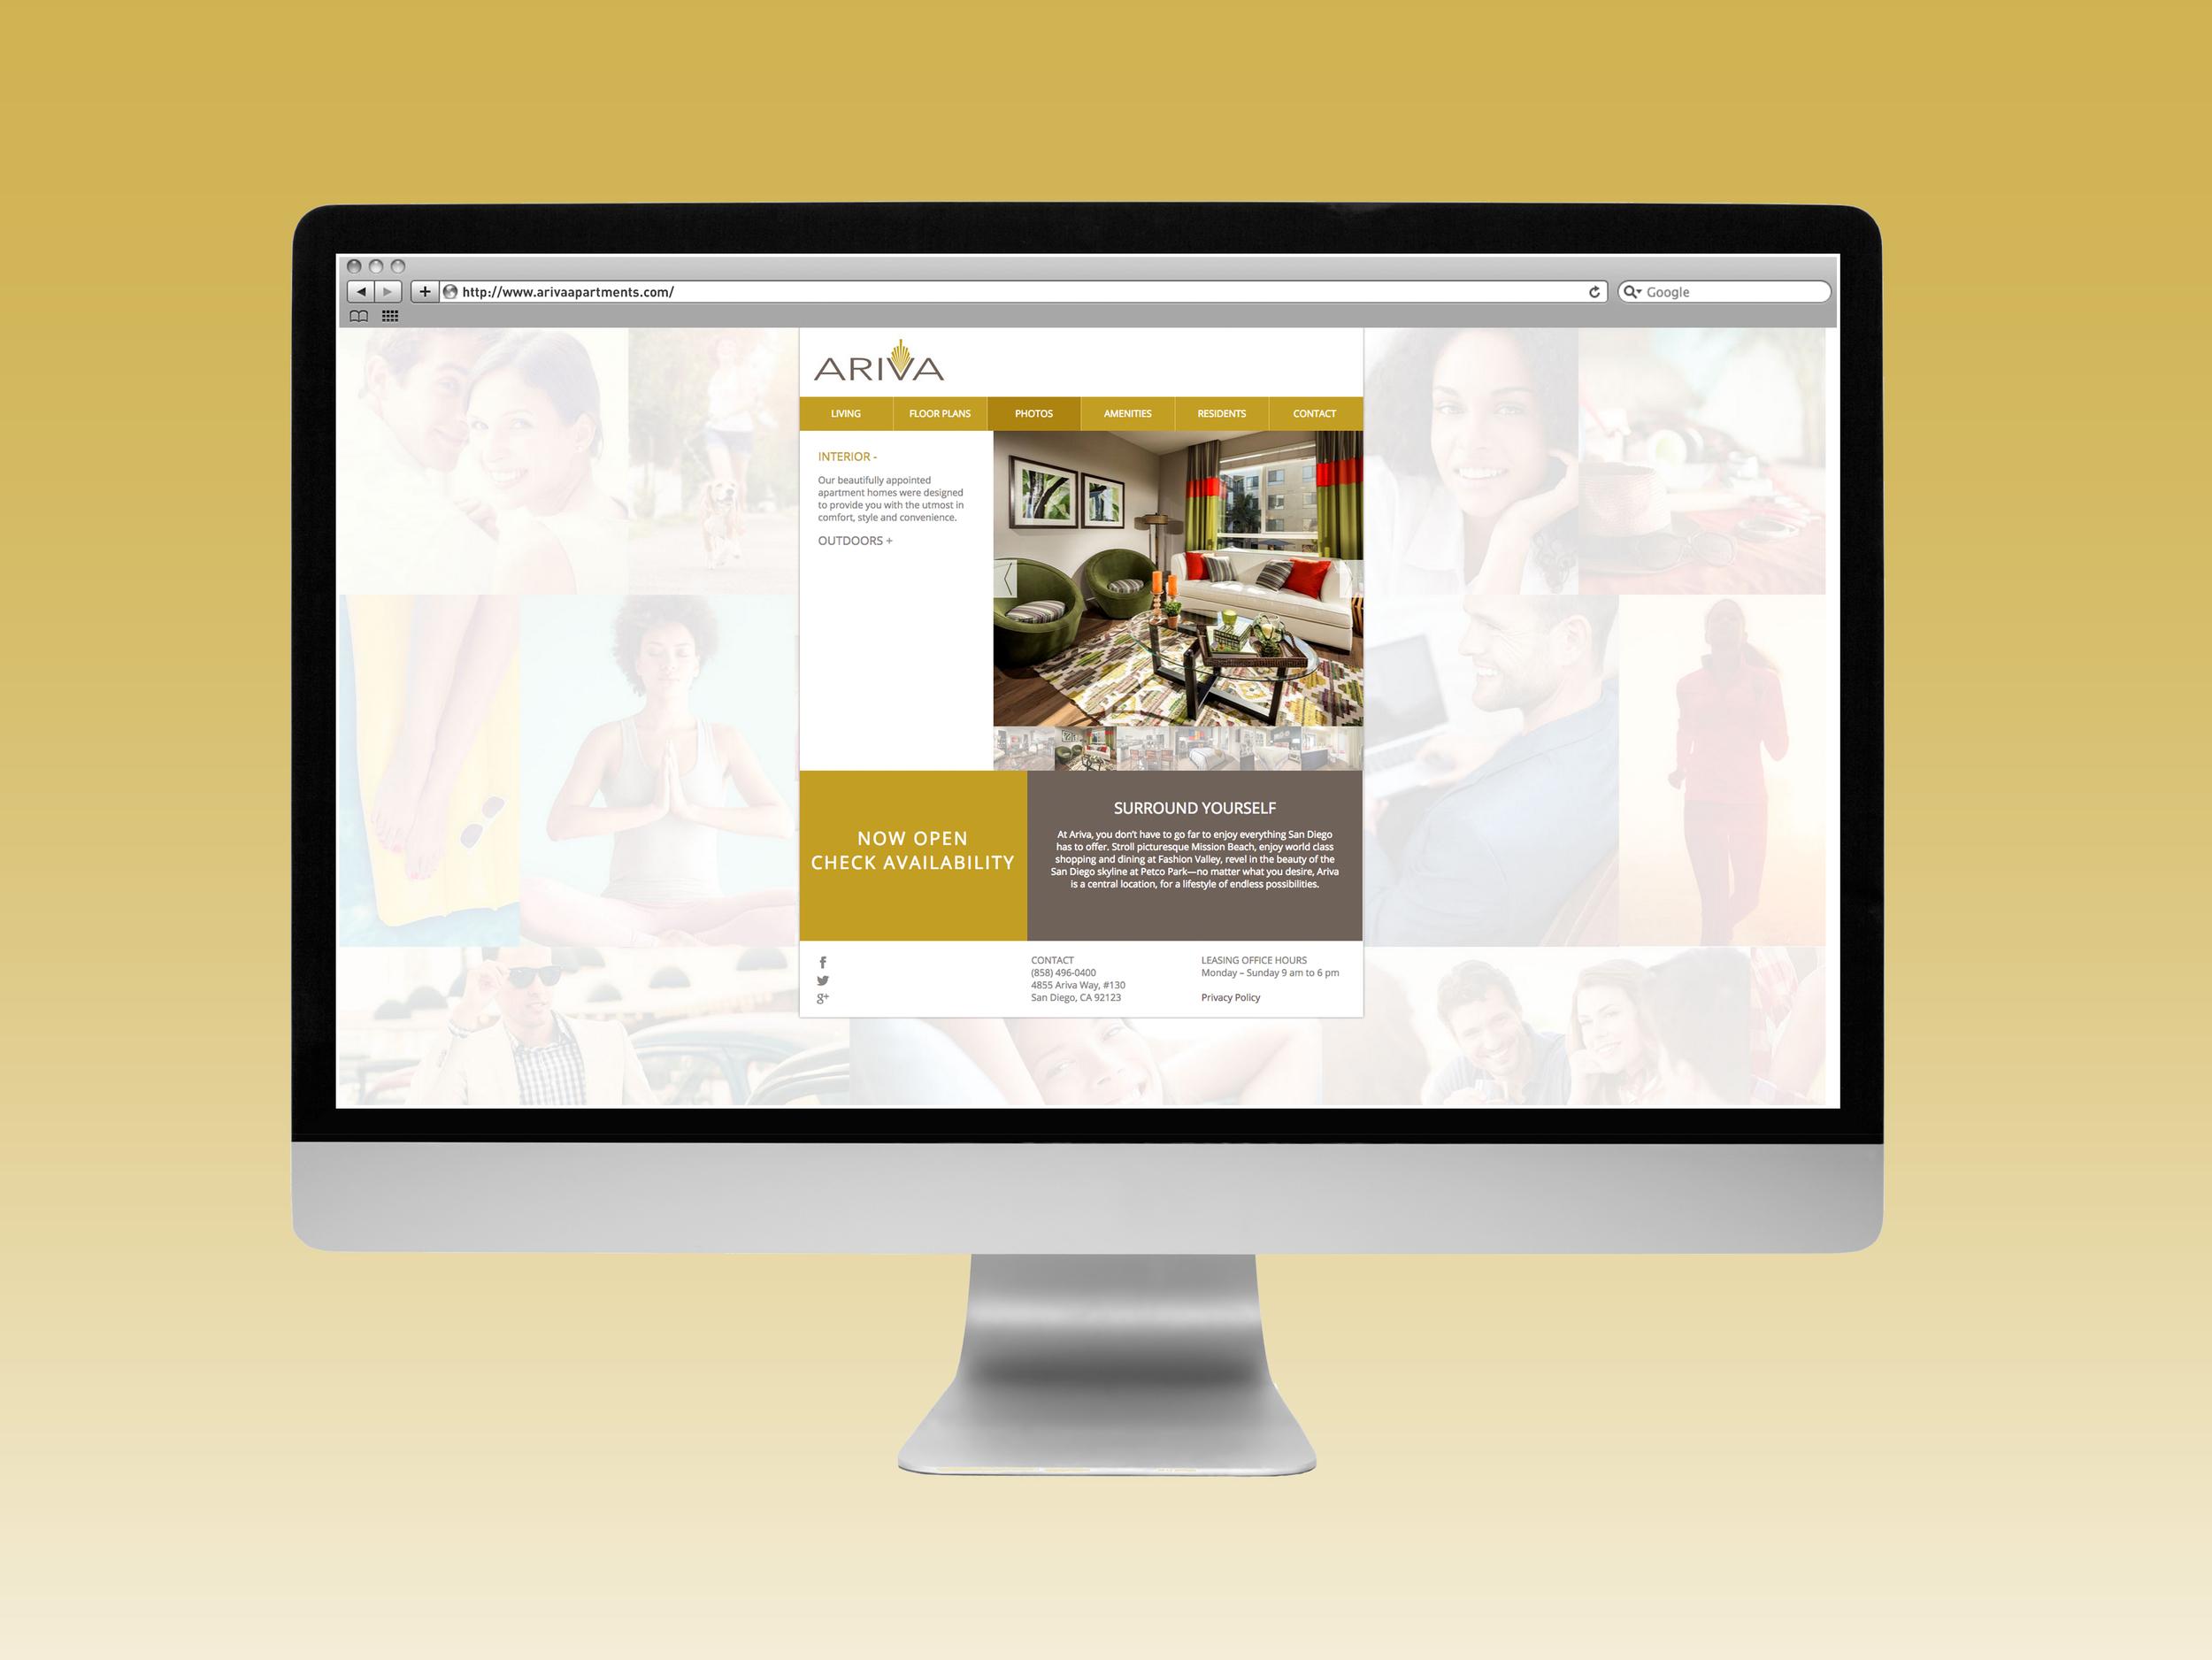 ARIVA_Website_web1 Photos.jpg